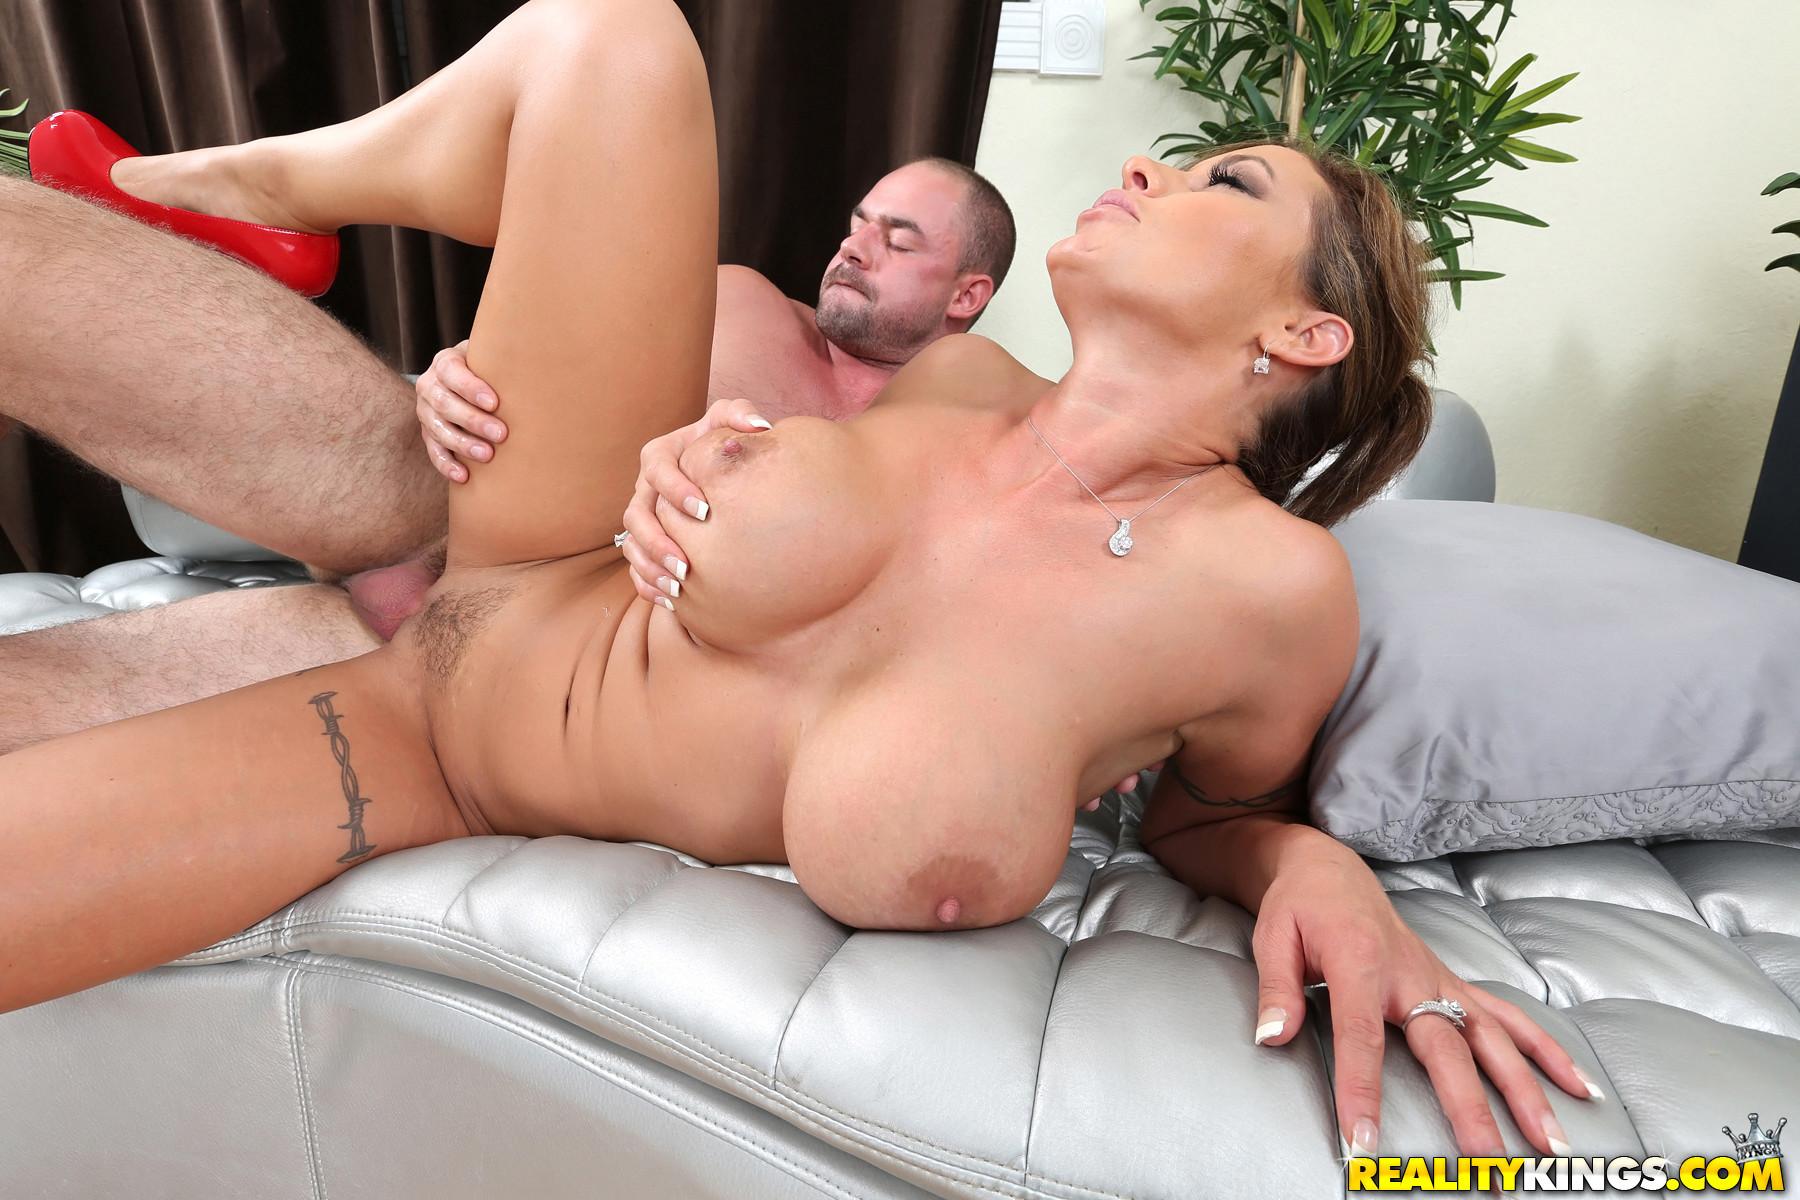 Nikki Delano Porn Videos  Verified Pornstar Profile  Pornhub